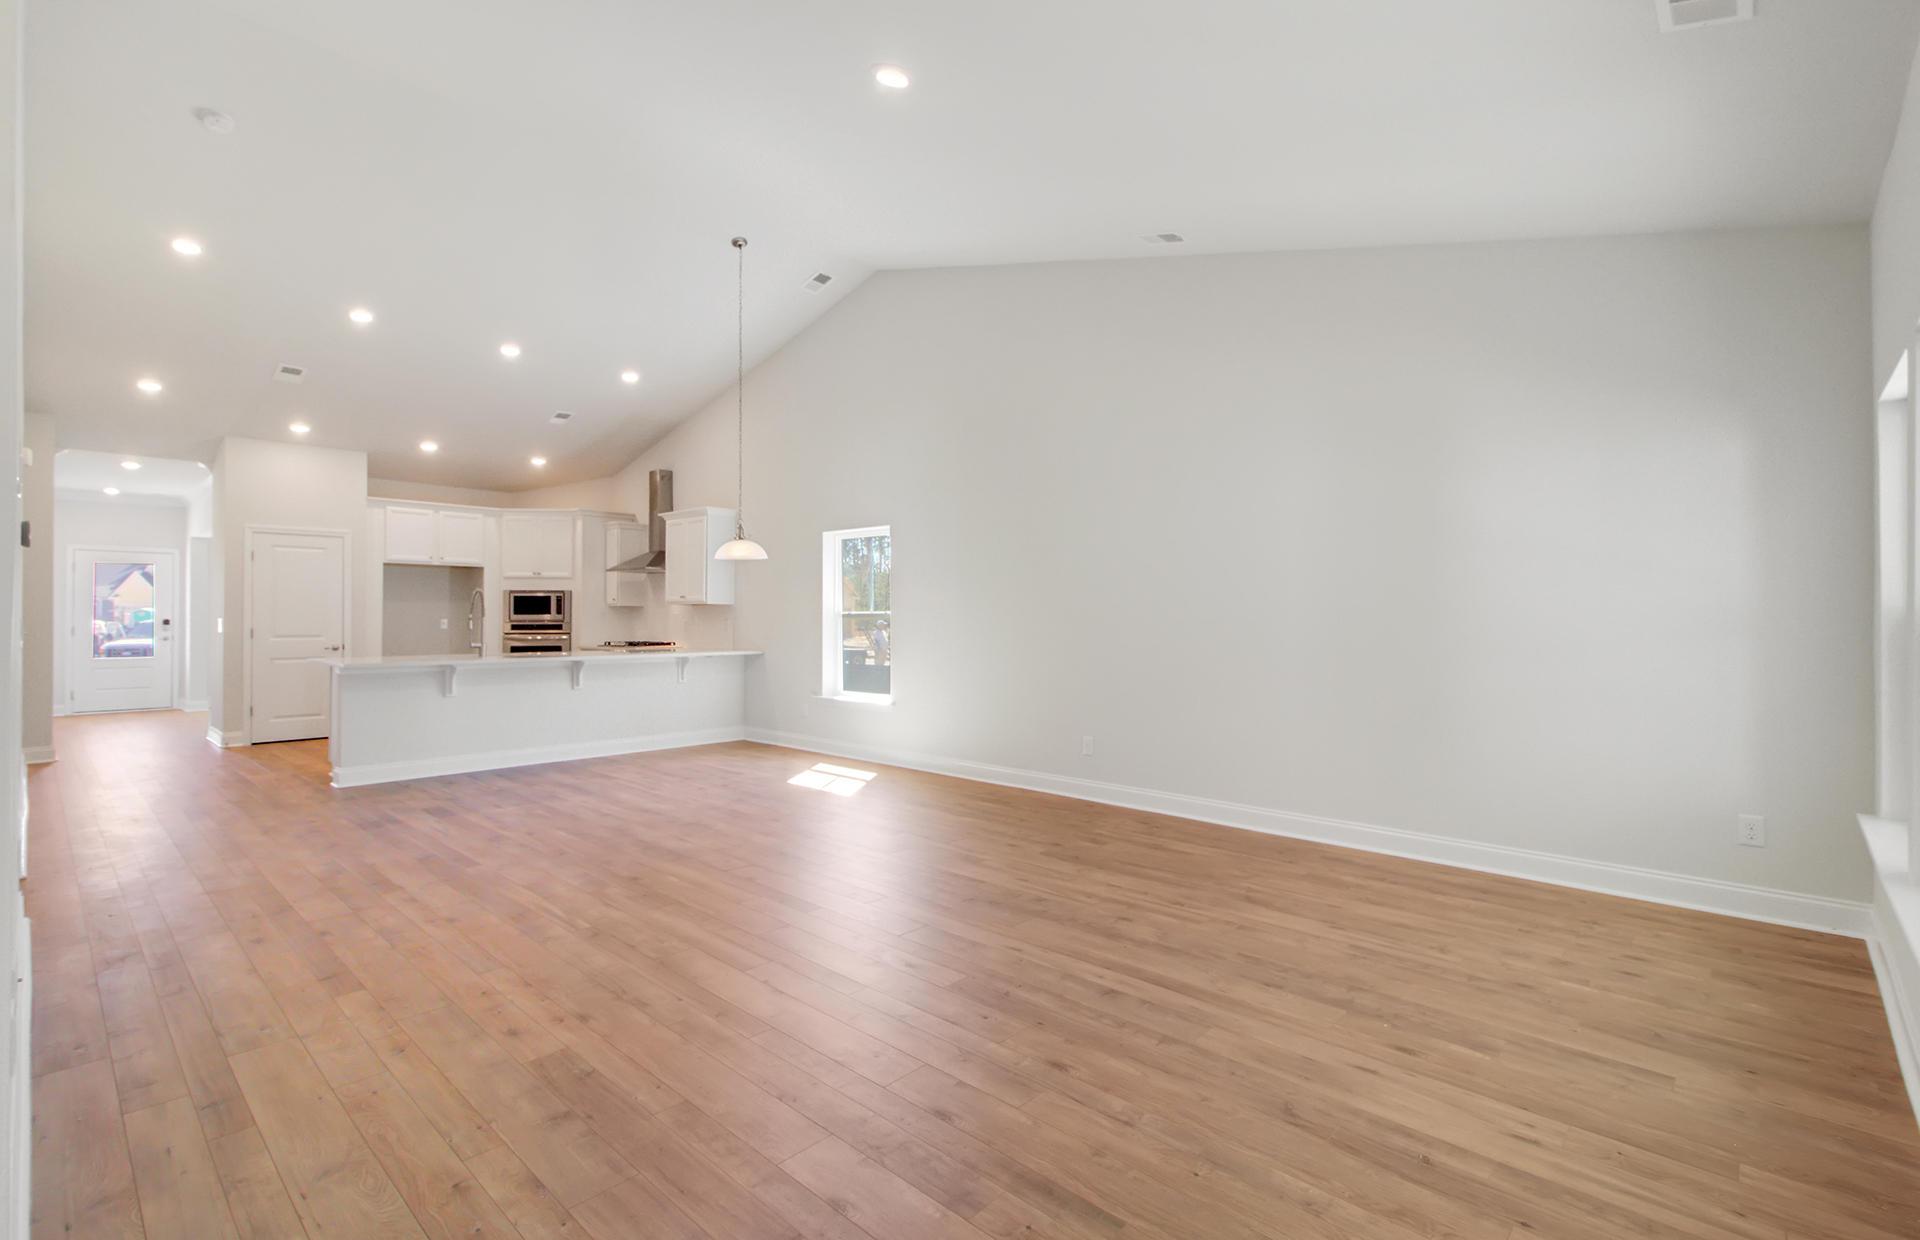 Park West Homes For Sale - 3062 Rice Field, Mount Pleasant, SC - 17